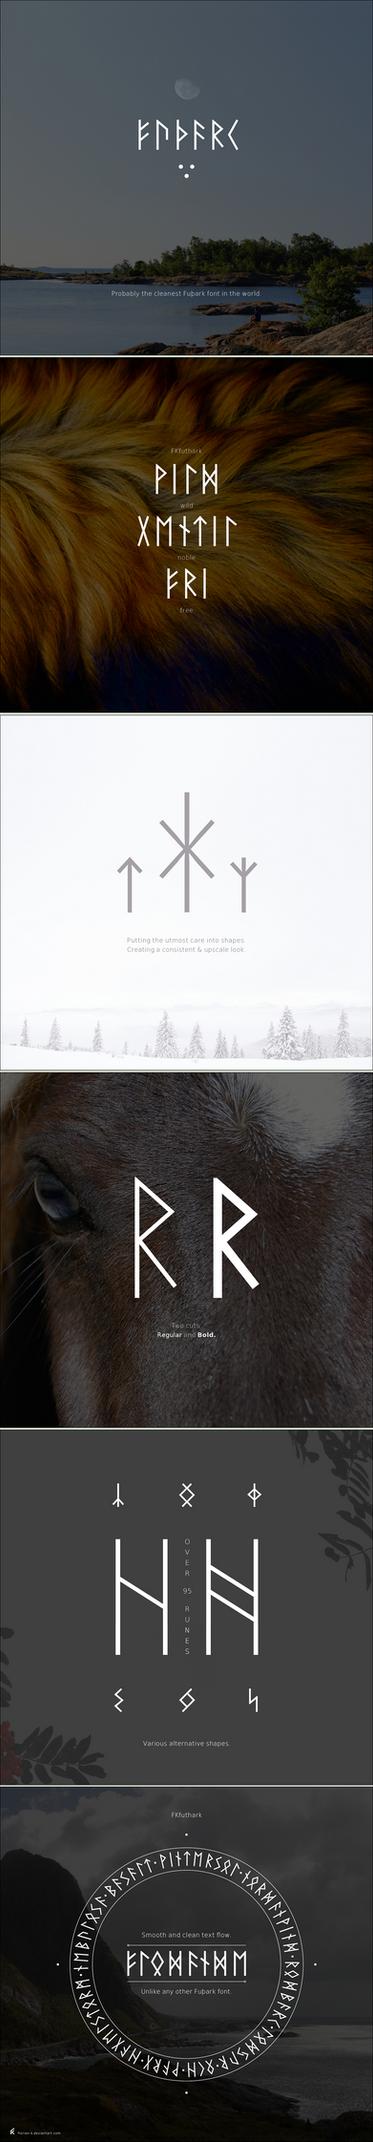 FKfuthark - new font specimen by Florian-K